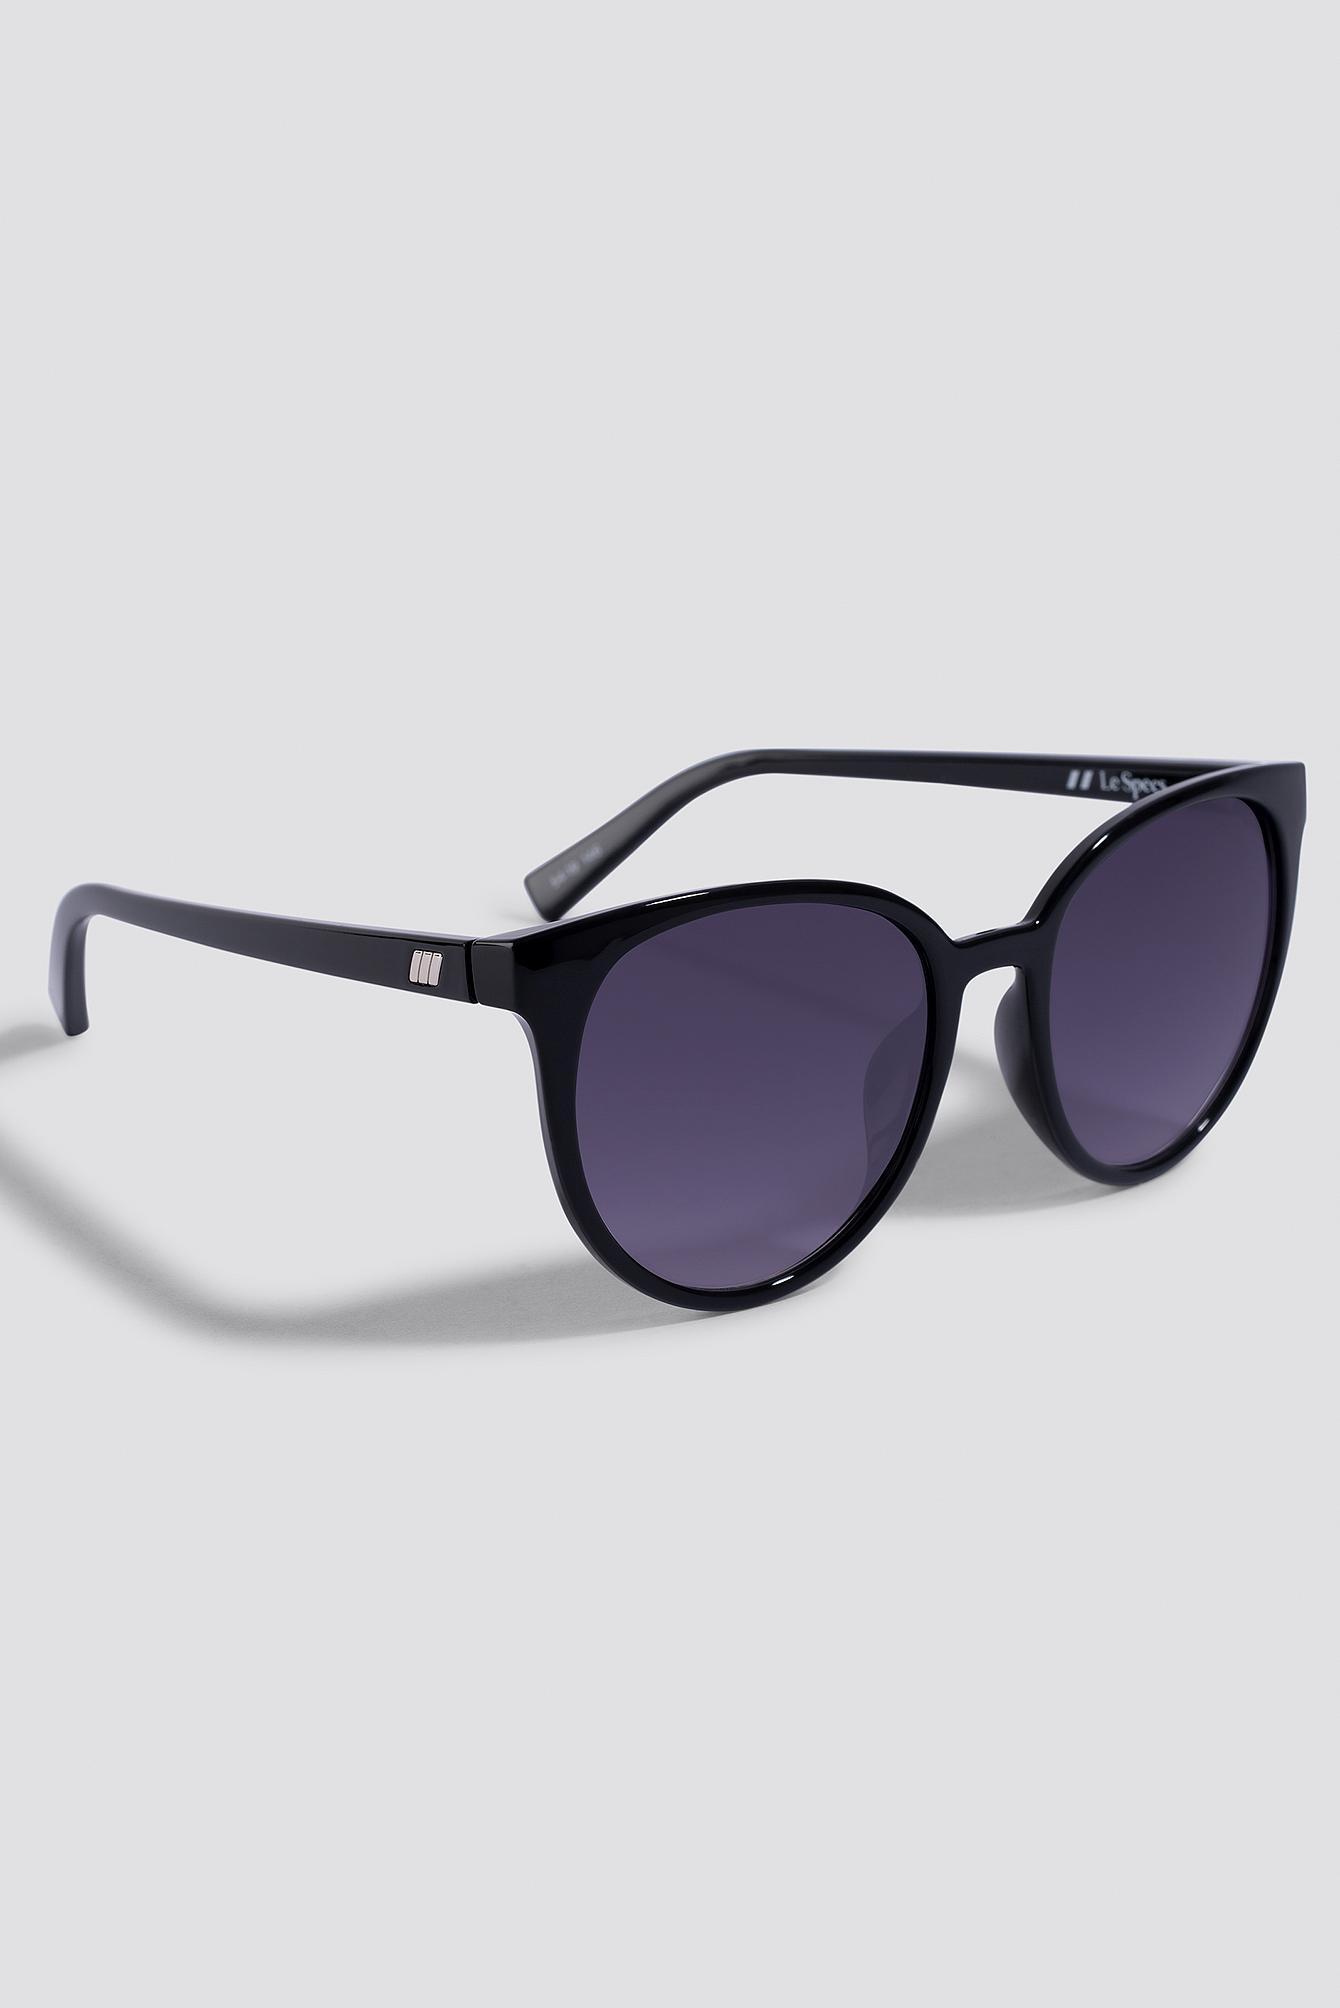 9d64699956 Lyst - Le Specs Armada Black smoke in Black